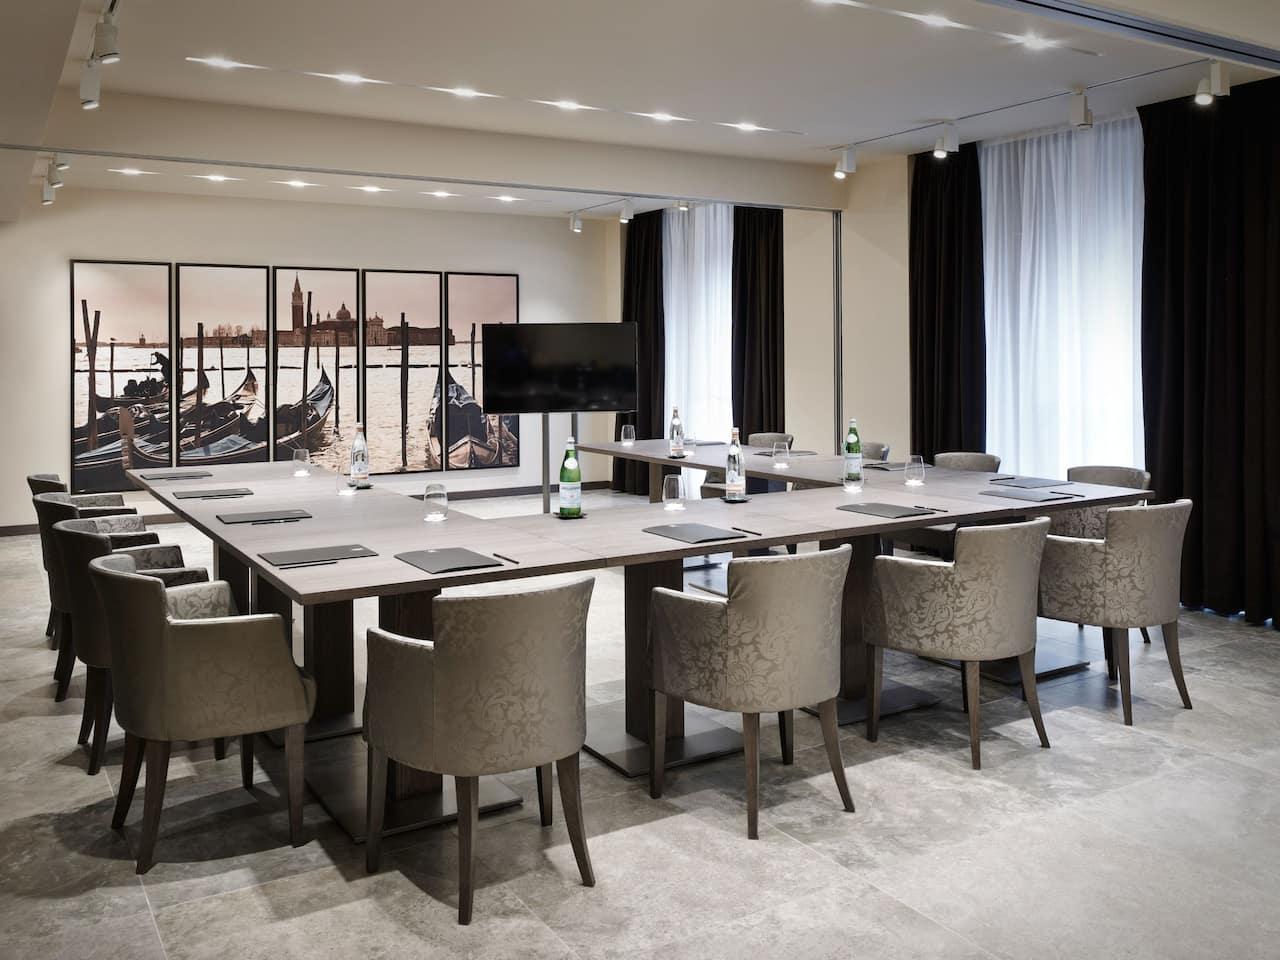 Hyatt Centric Murano Venice Hotel Meeting Room